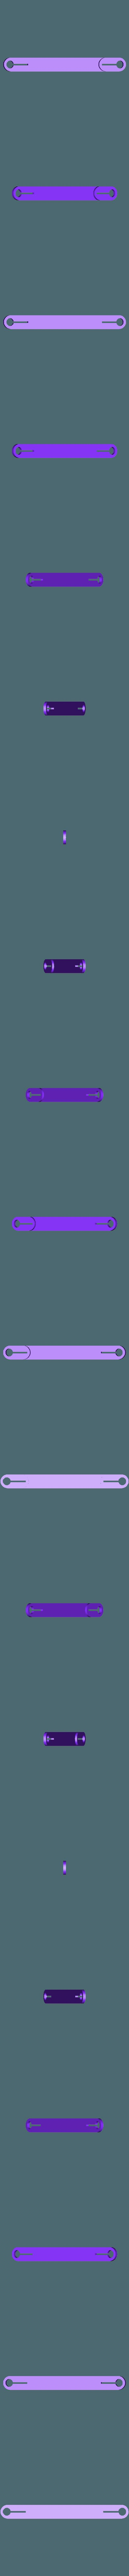 9cm_Strap_Holes.stl Download free STL file Flexible Filament Bikini Top and Bottom • 3D printable design, SexyCyborg